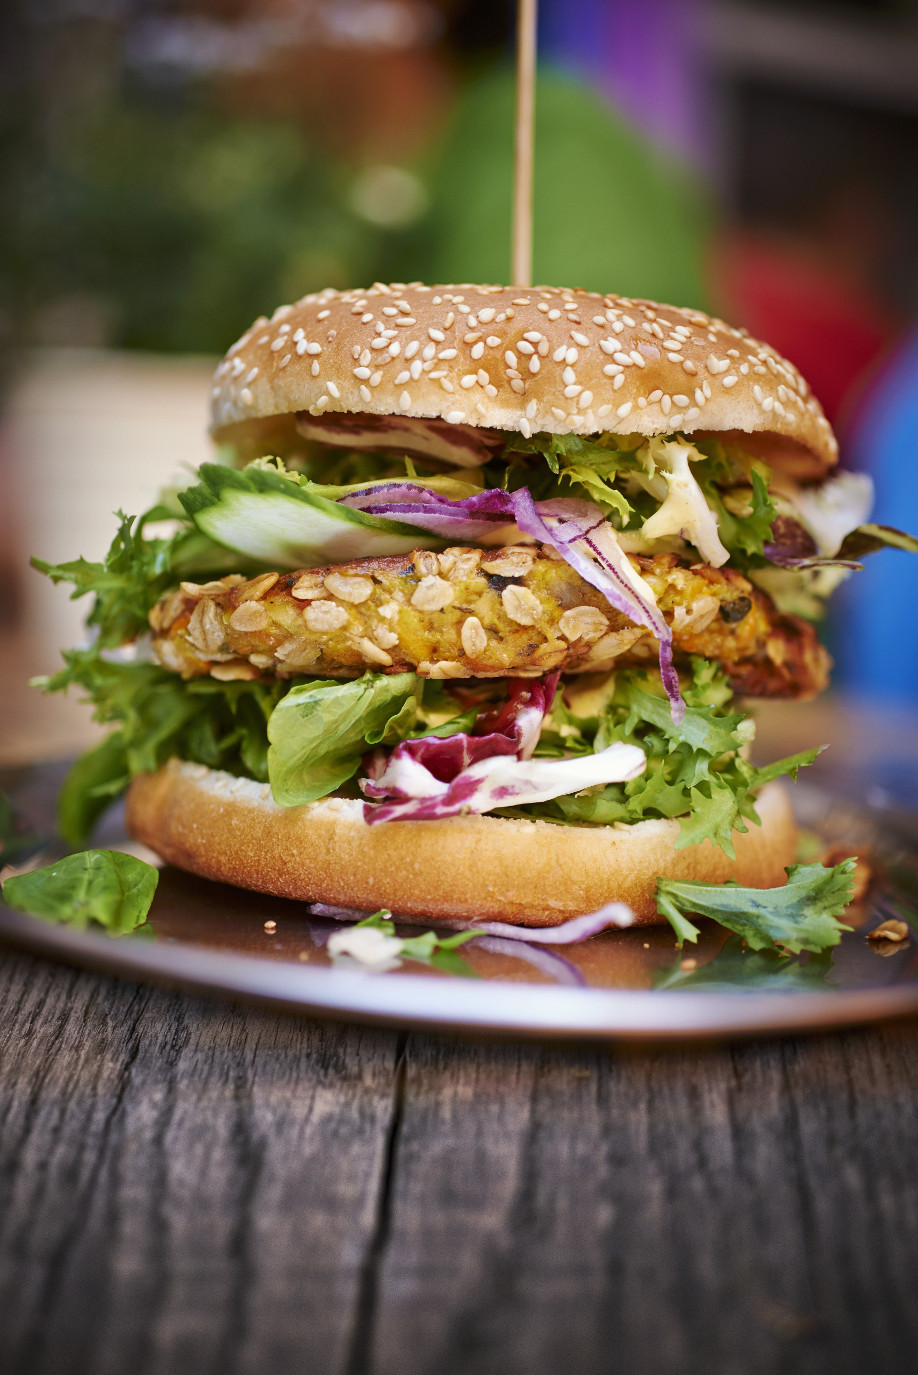 Westwing-burgery-wgetar